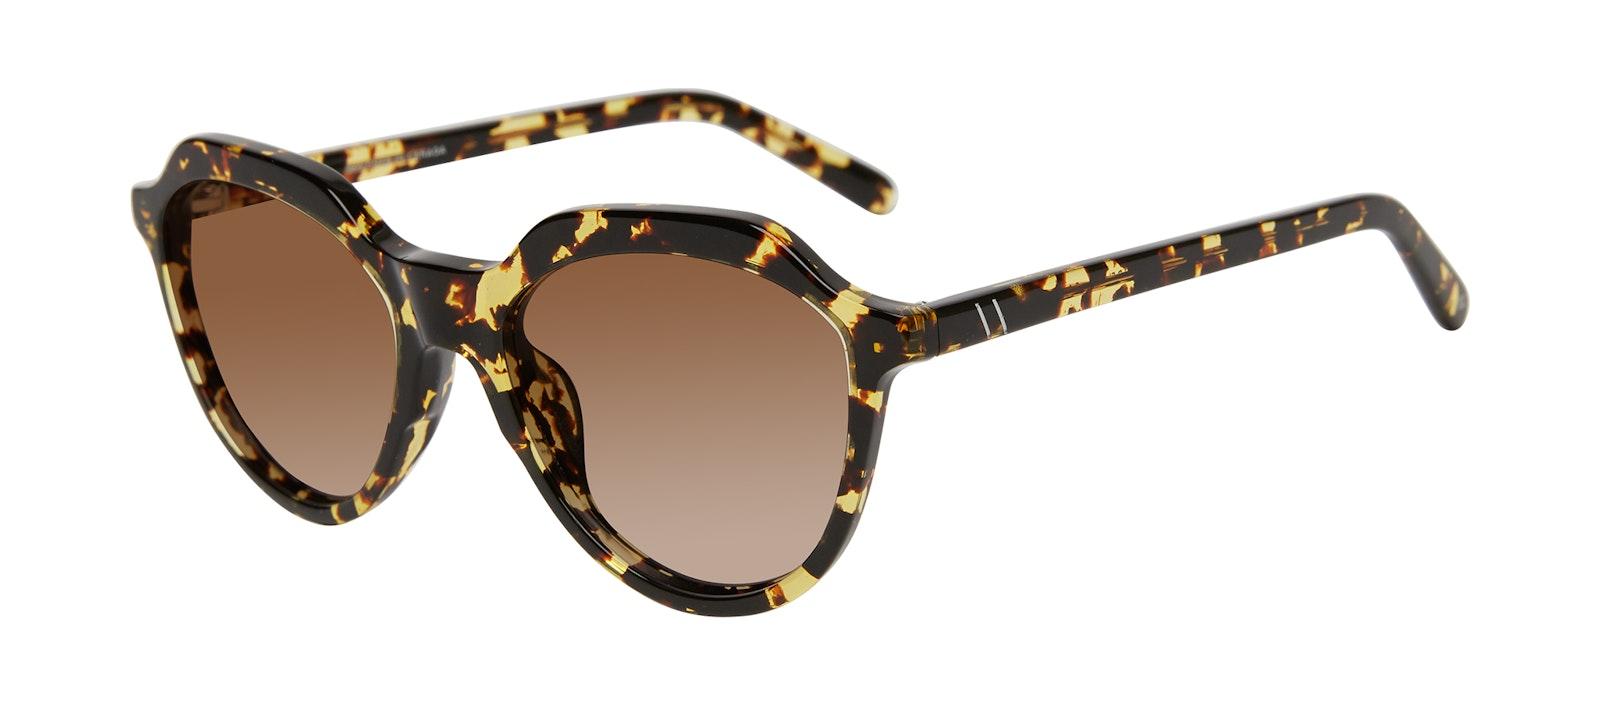 Affordable Fashion Glasses Round Sunglasses Women Jetsetter Gold Flake Tilt